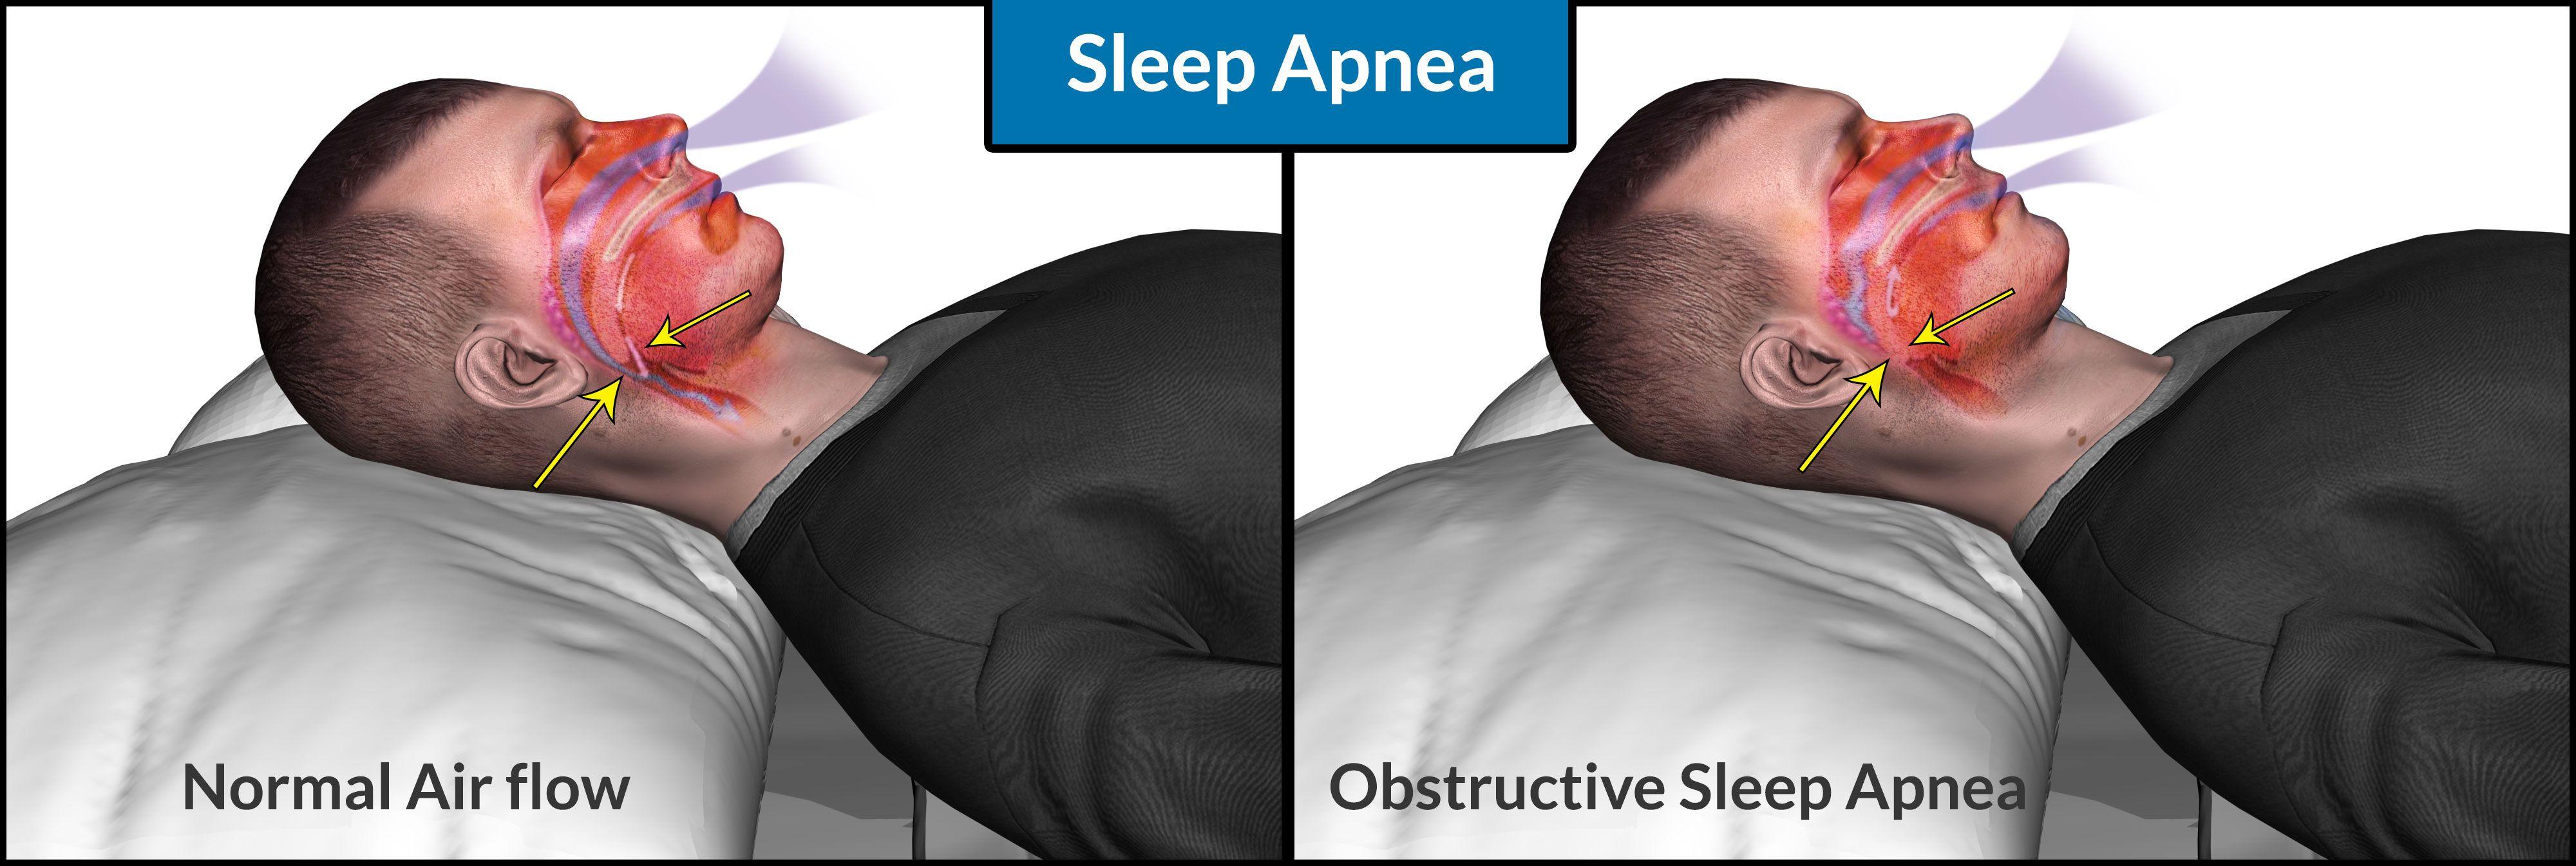 sleep apnea causes symptoms dangers self treatment cpap therapy treatment - Sleep Apnea Pillow